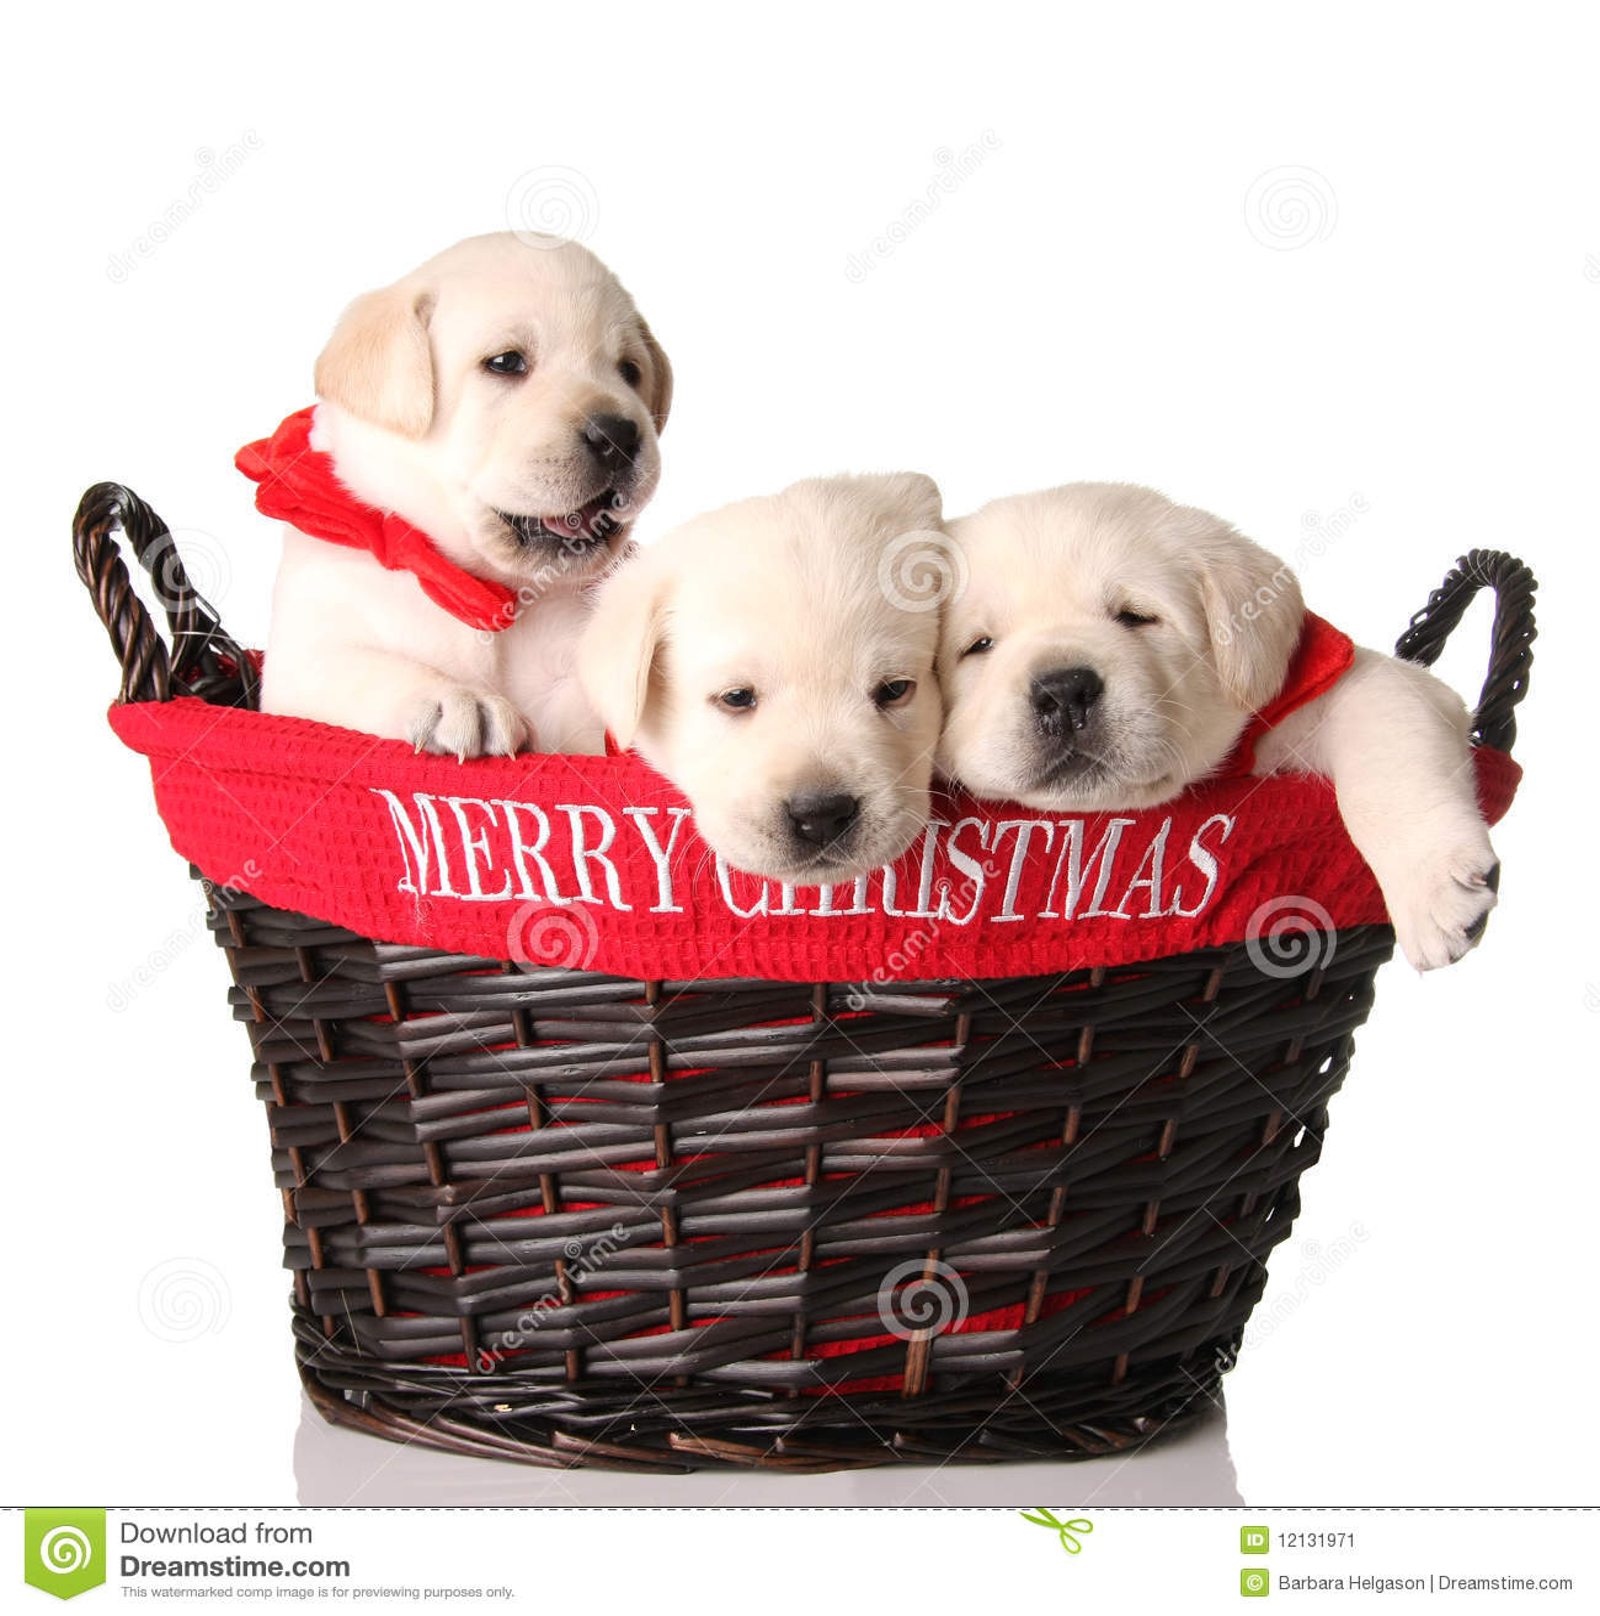 Three Christmas Puppies Stock Image - Image: 12131971